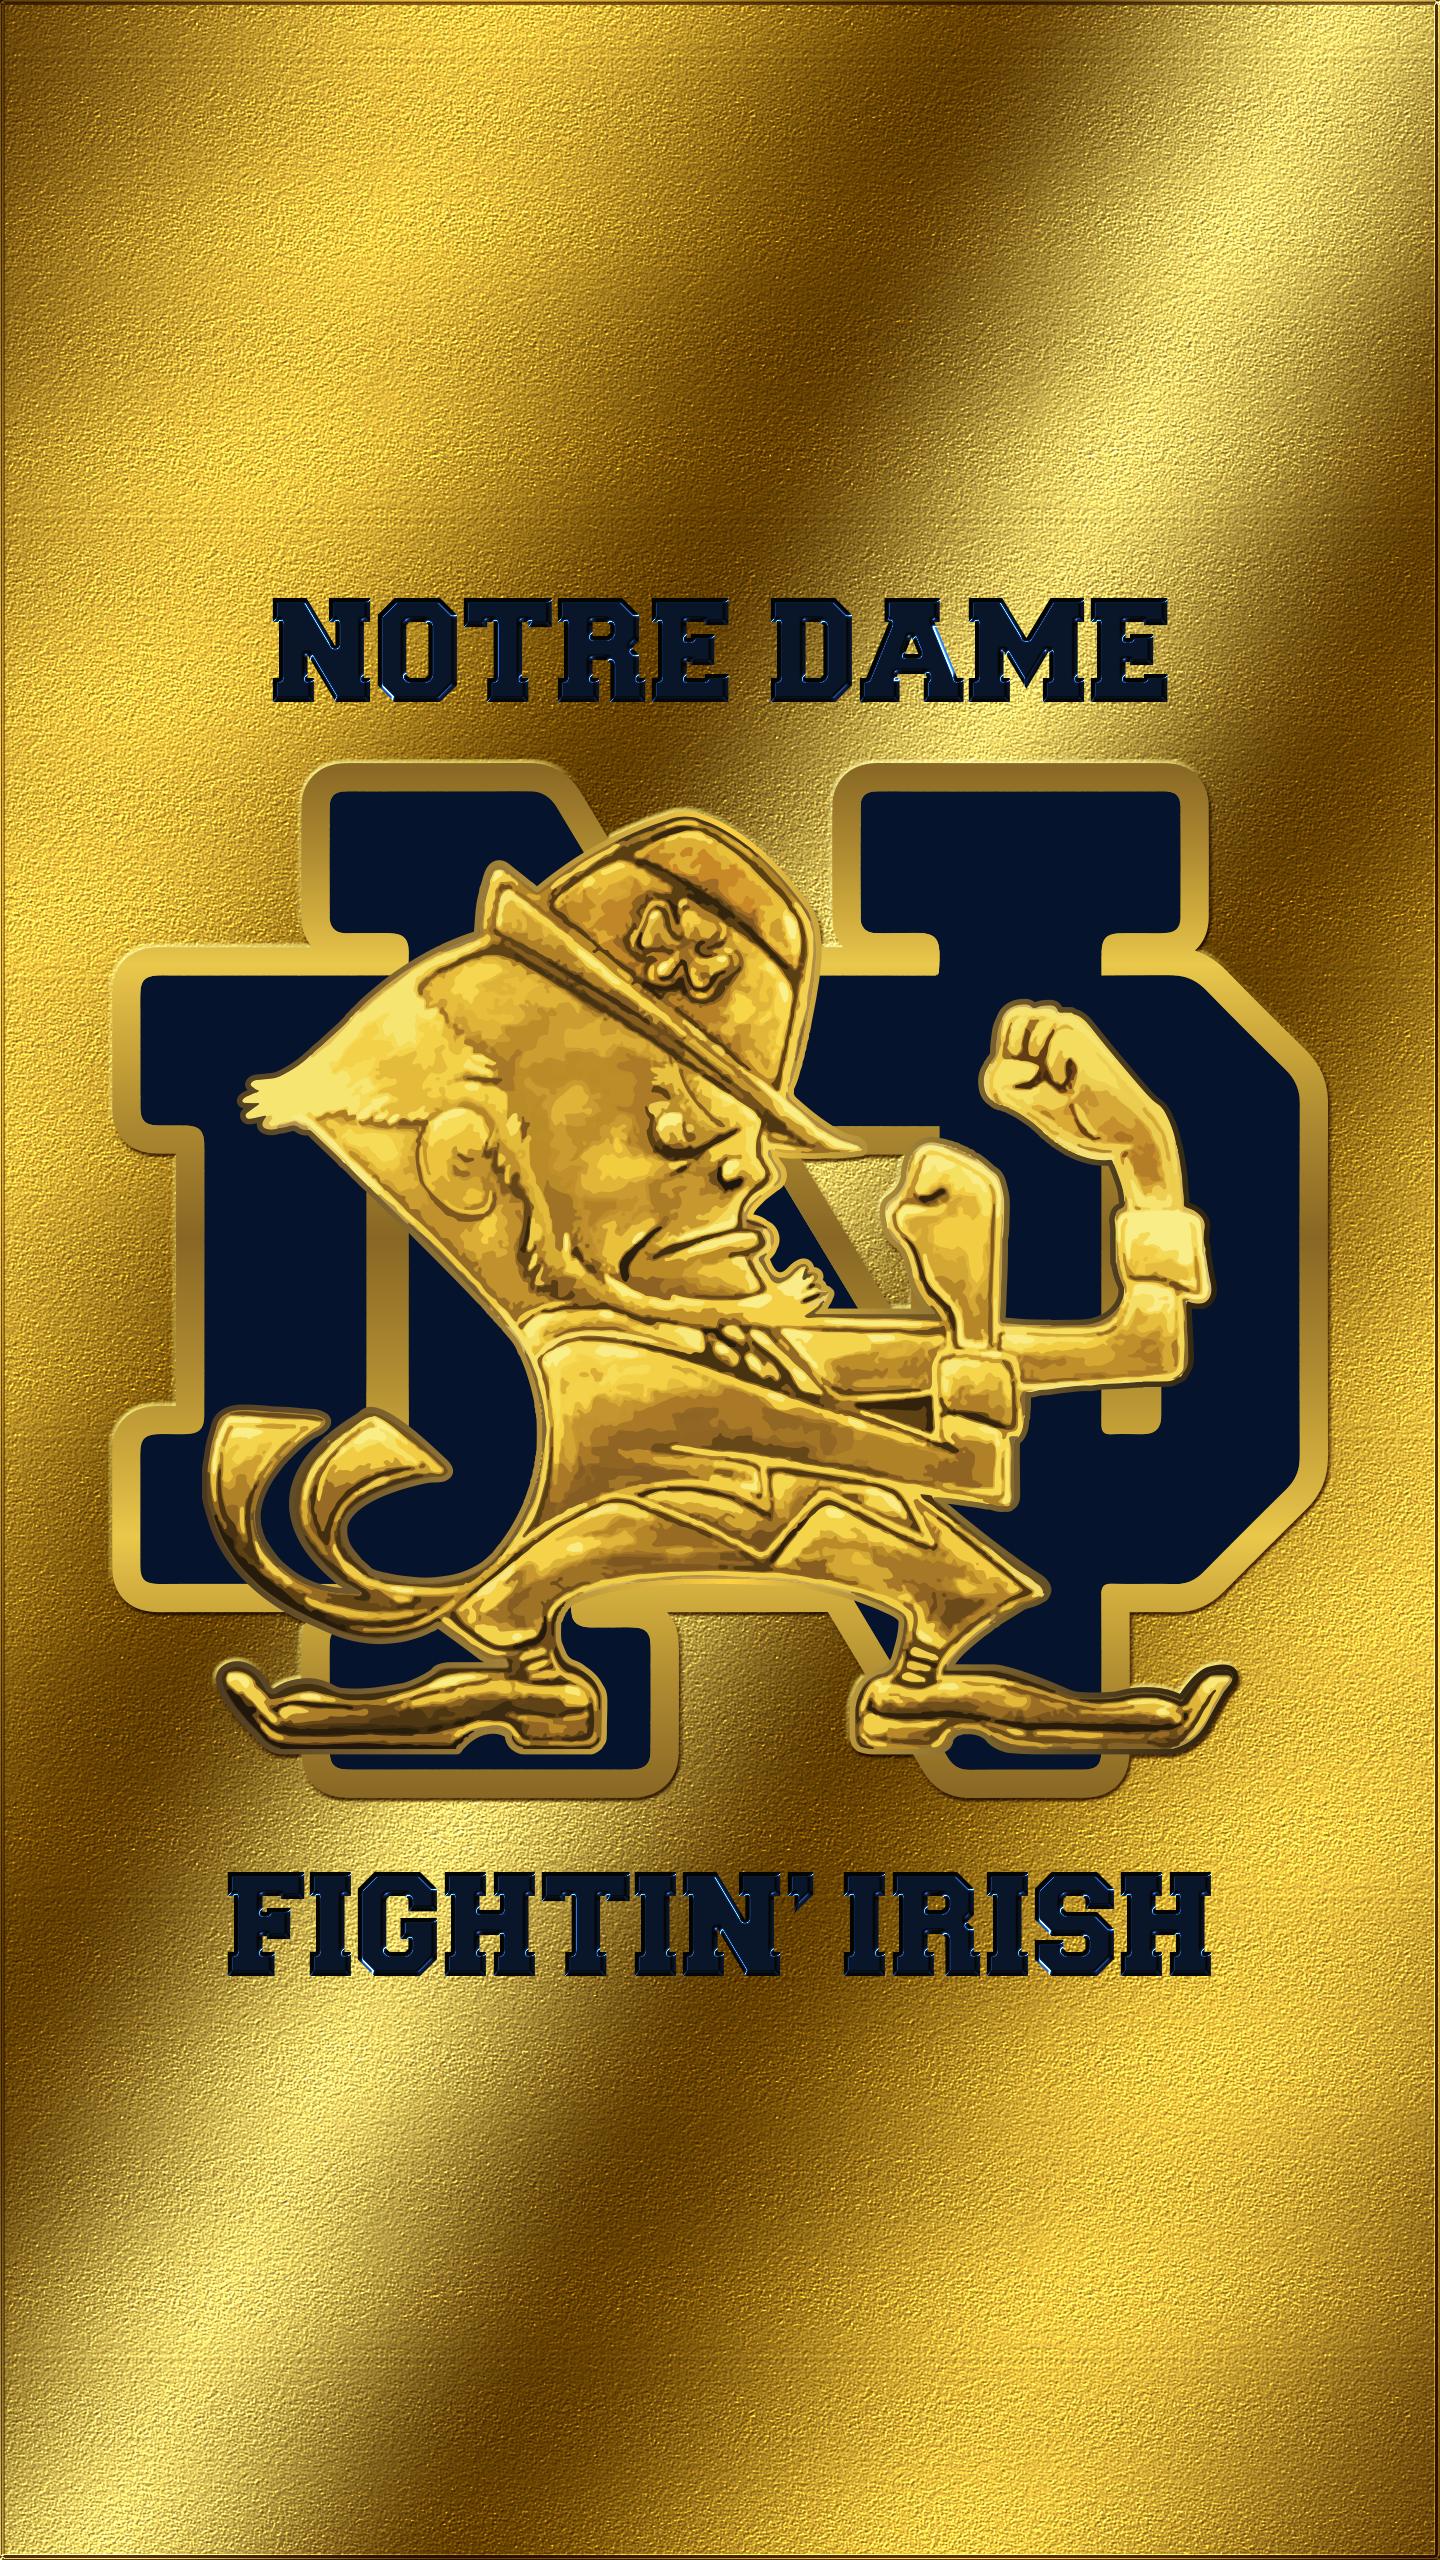 Mma Notre Football Wallpapers Notre Dame Football Wallpapers Notre Dam In 2020 Notre Dame Wallpaper Notre Dame Fighting Irish Football Norte Dame Fighting Irish